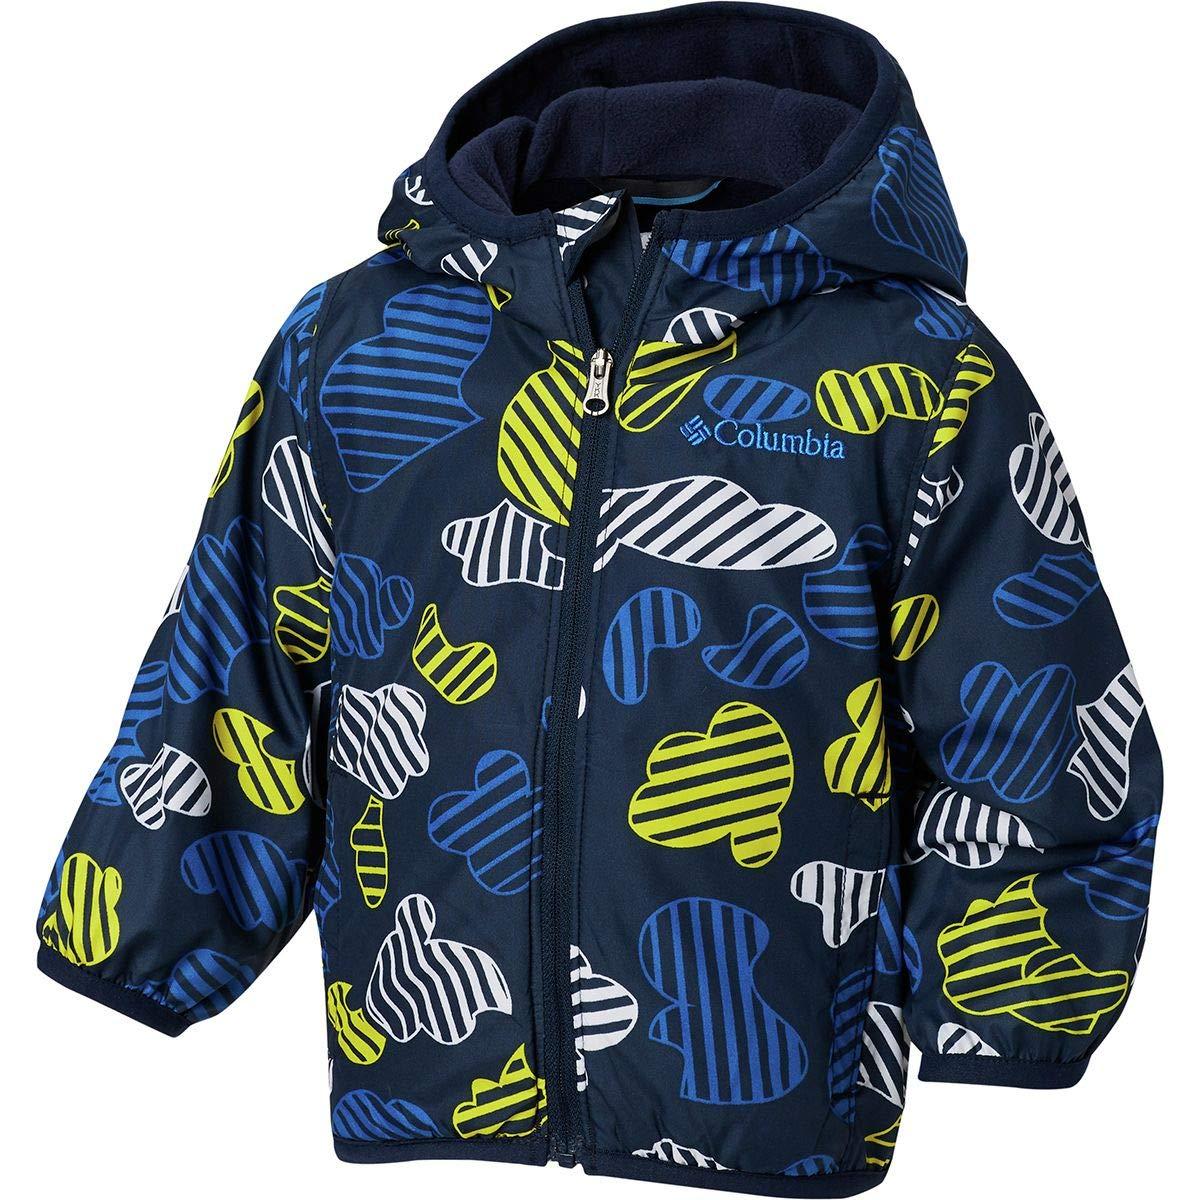 Columbia Kids Baby Boy's Mini Pixel Grabber¿ II Wind Jacket (Infant/Toddler) Collegiate Navy Cloudy Came 3T